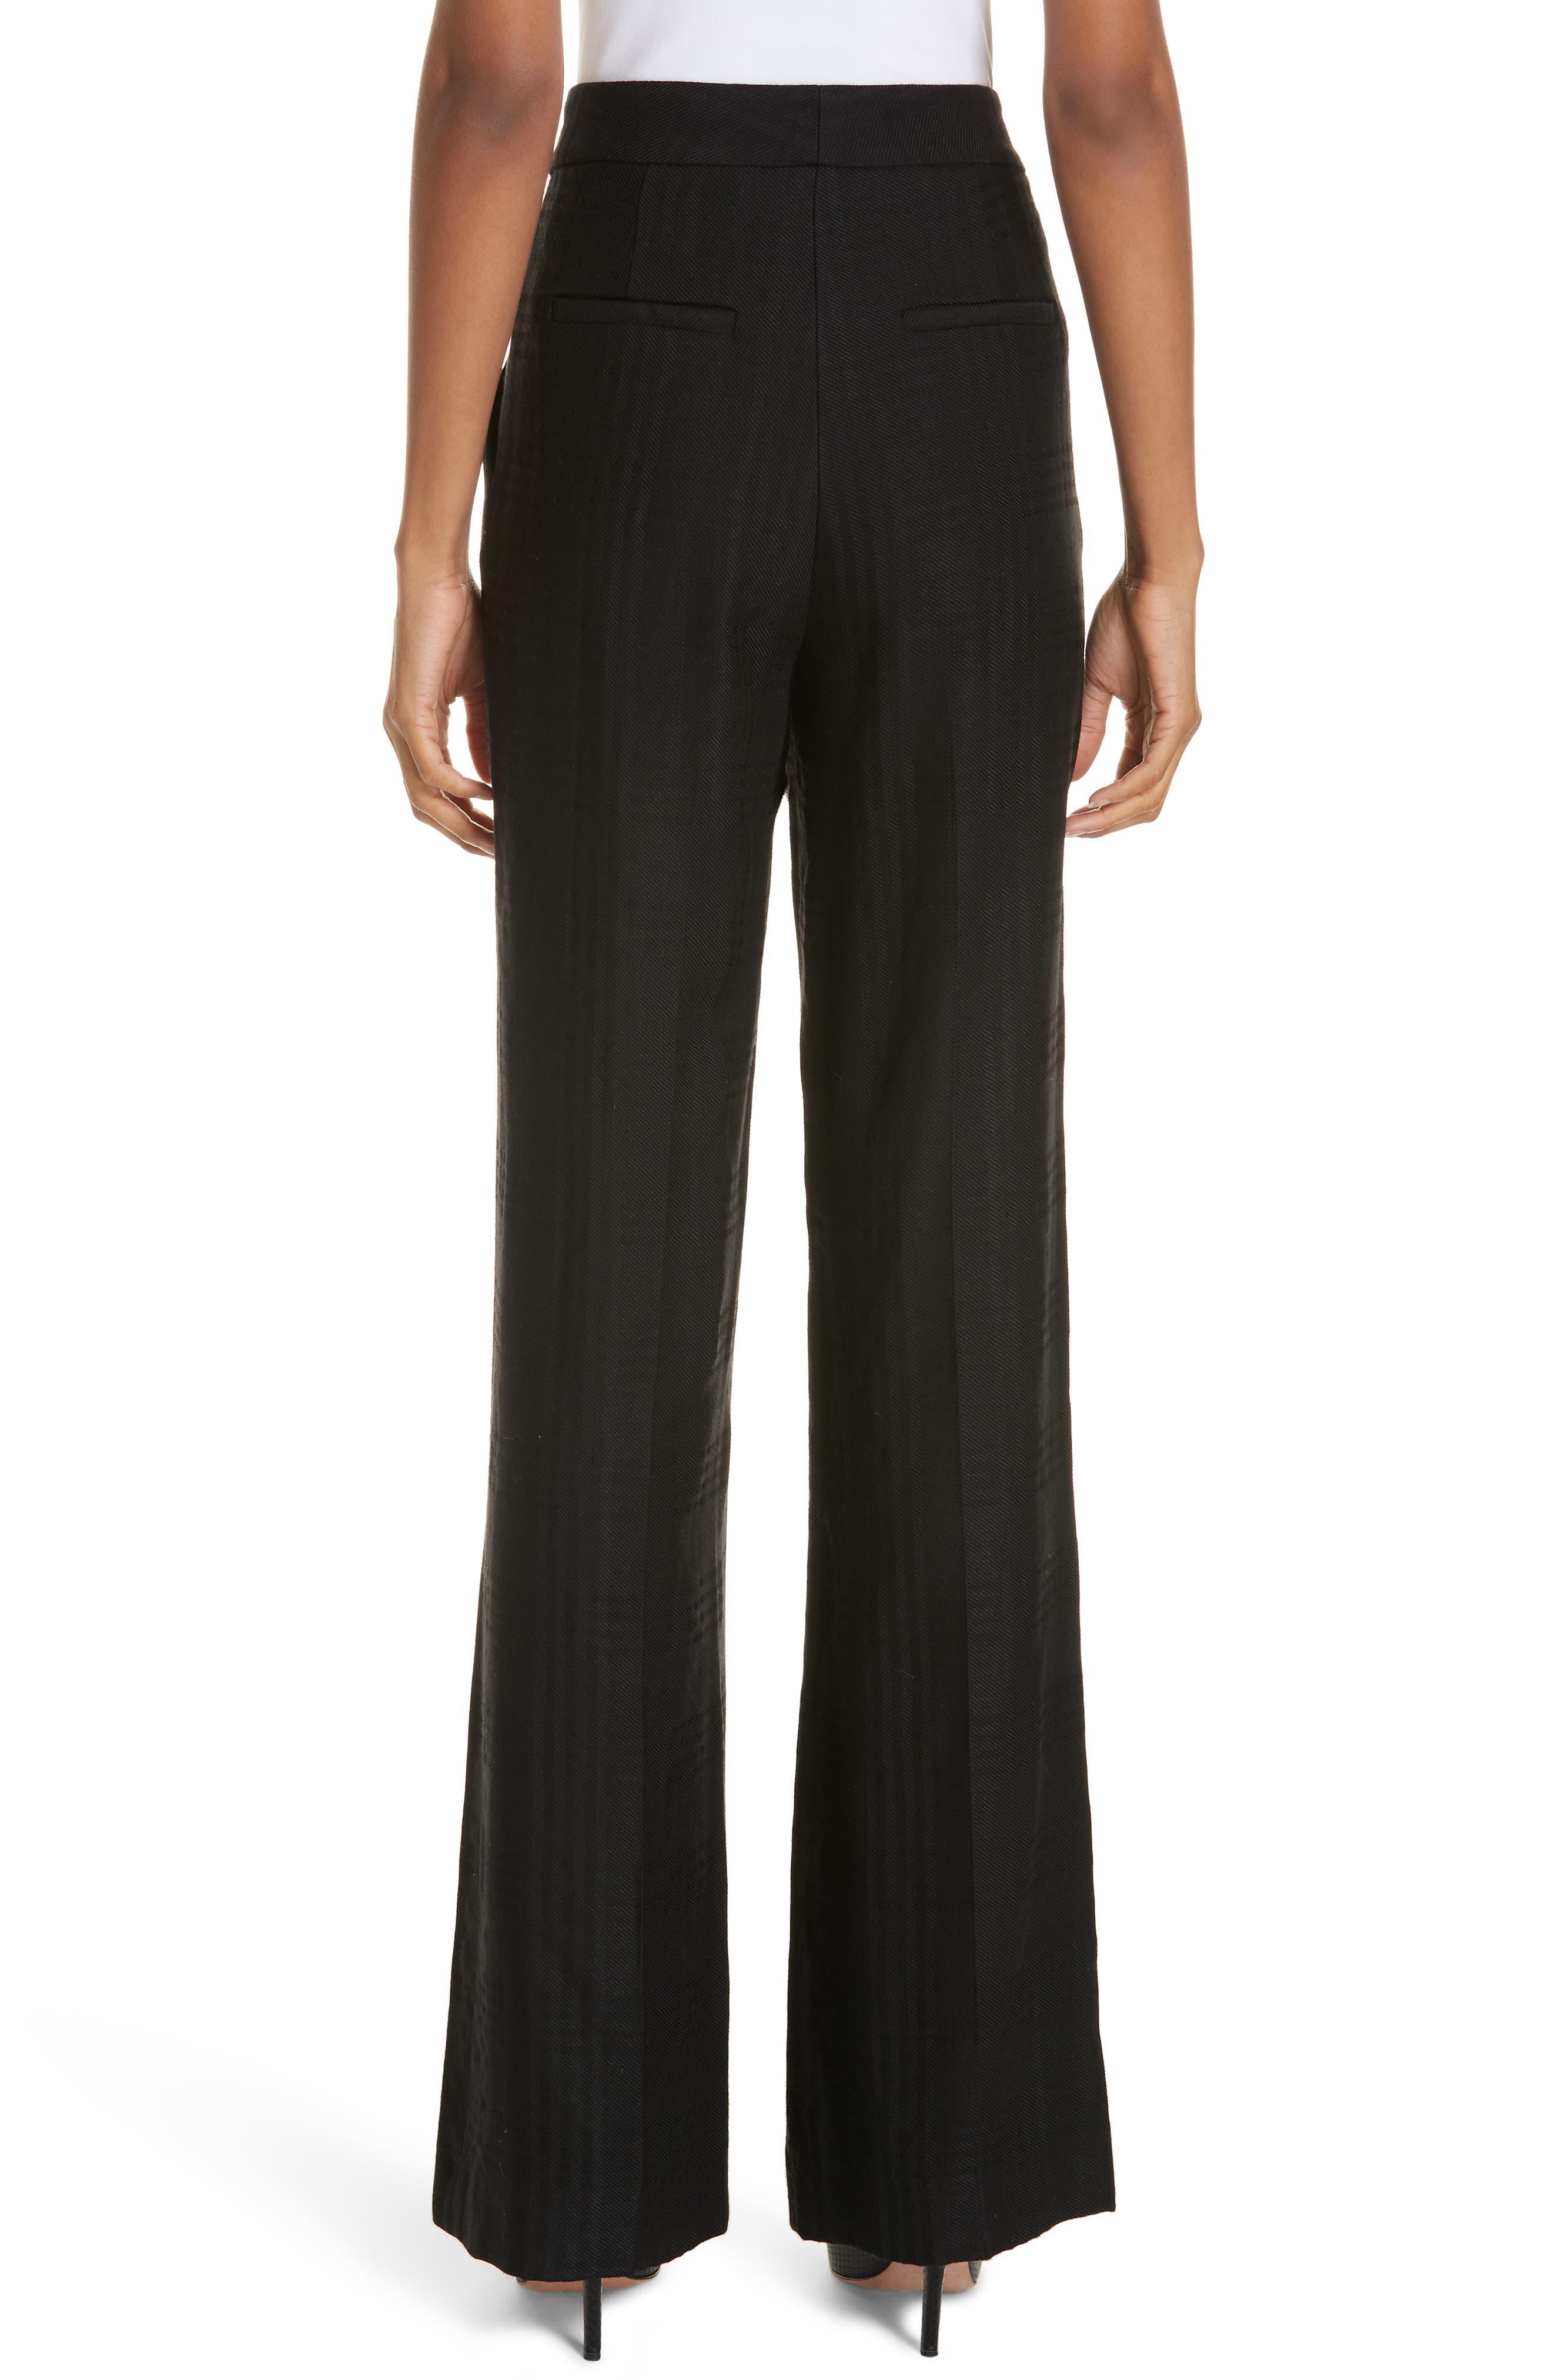 Tuli Check Button Detail Pants,                             Alternate thumbnail 2, color,                             BLACK/ BLACK